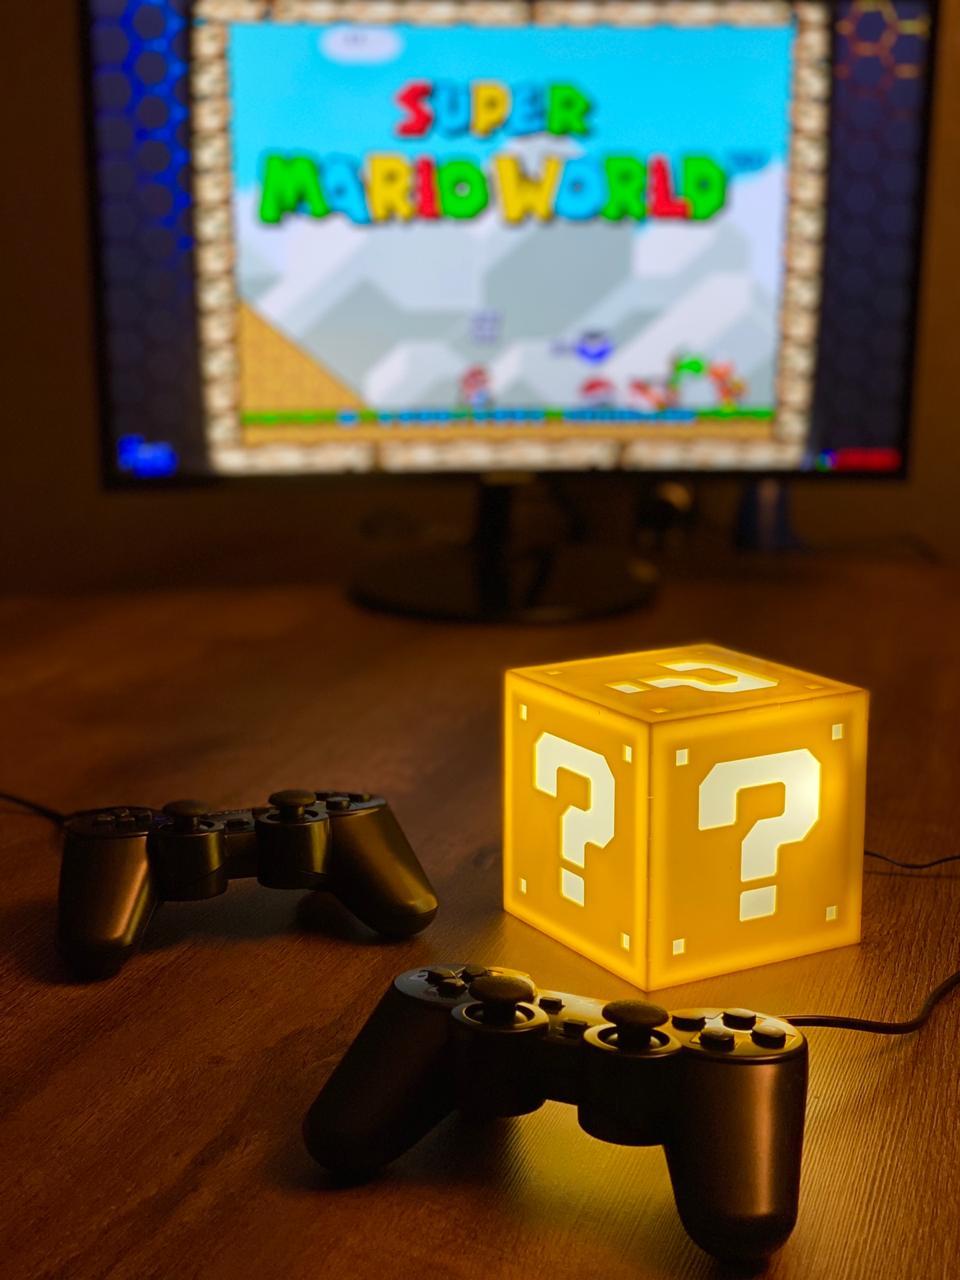 Cubo Retrô Box Interrogação Mario: Fliperama Arcade Game (20.000 Jogos) PlayStation/Nintendo/SNES/Mega Drive/Sega Saturn